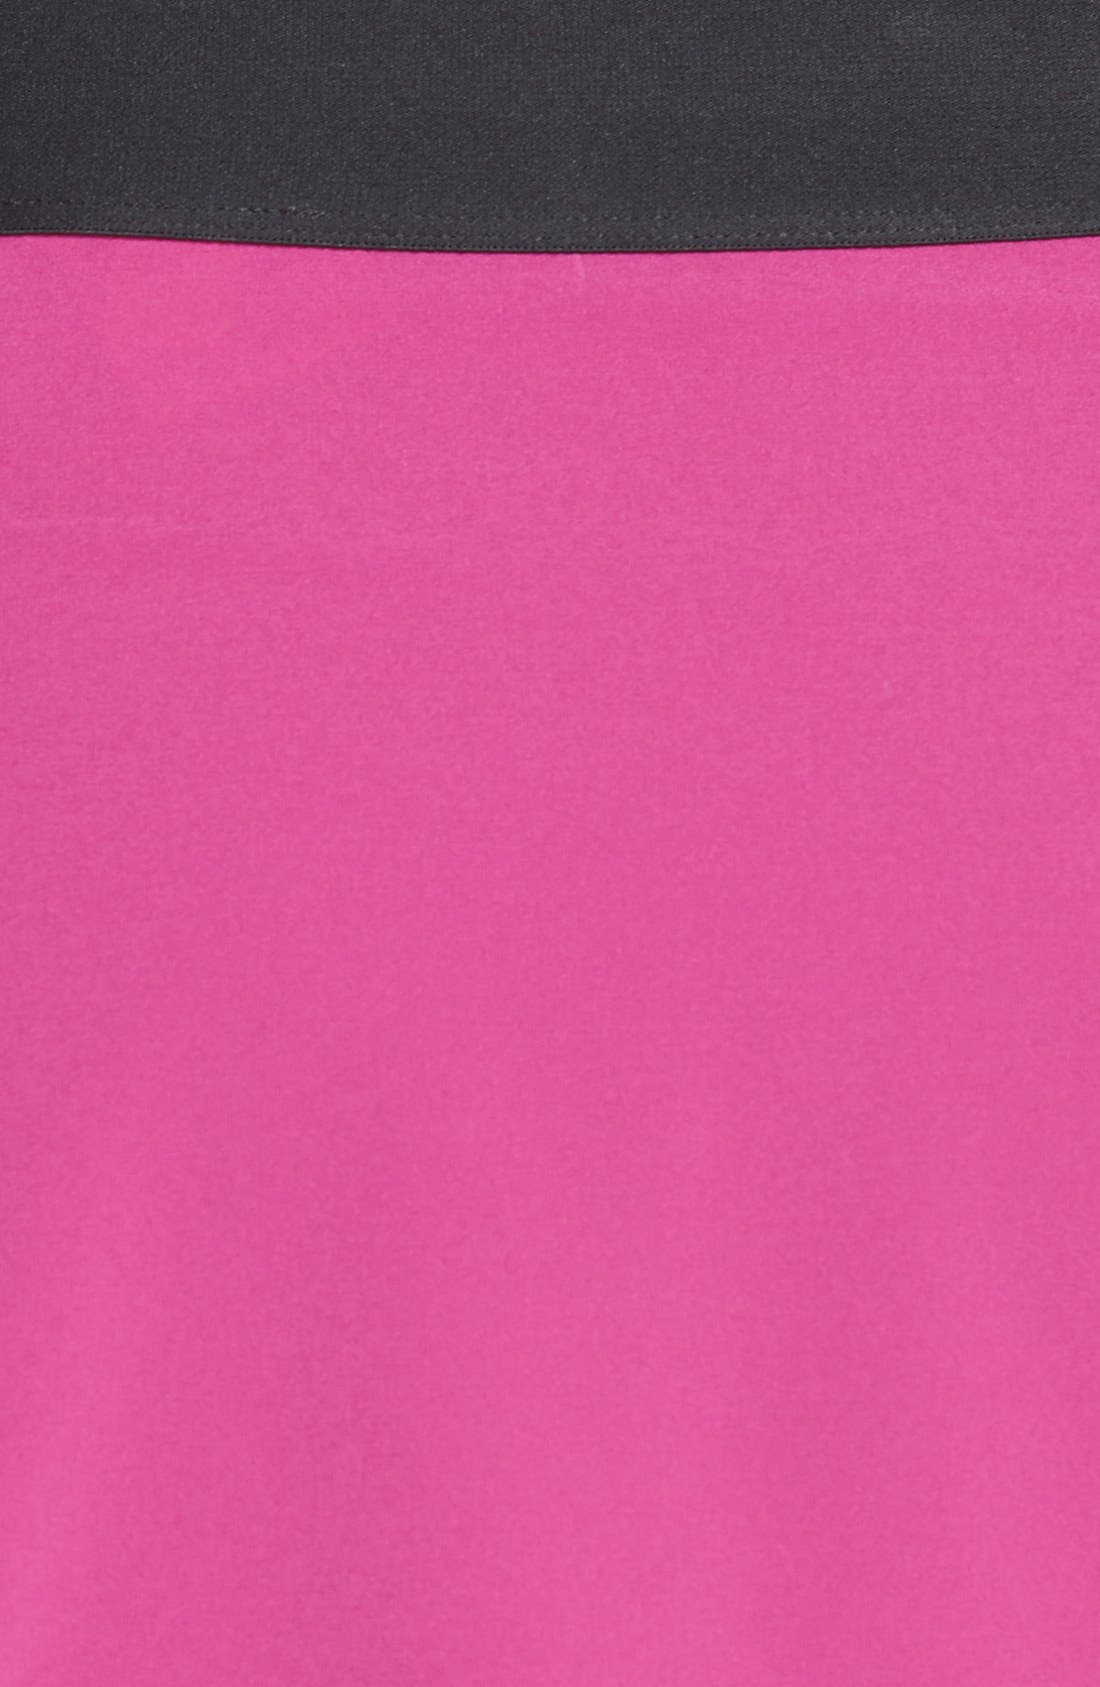 Alternate Image 3  - Nike 'Slam' Dri-FIT Print Skirt